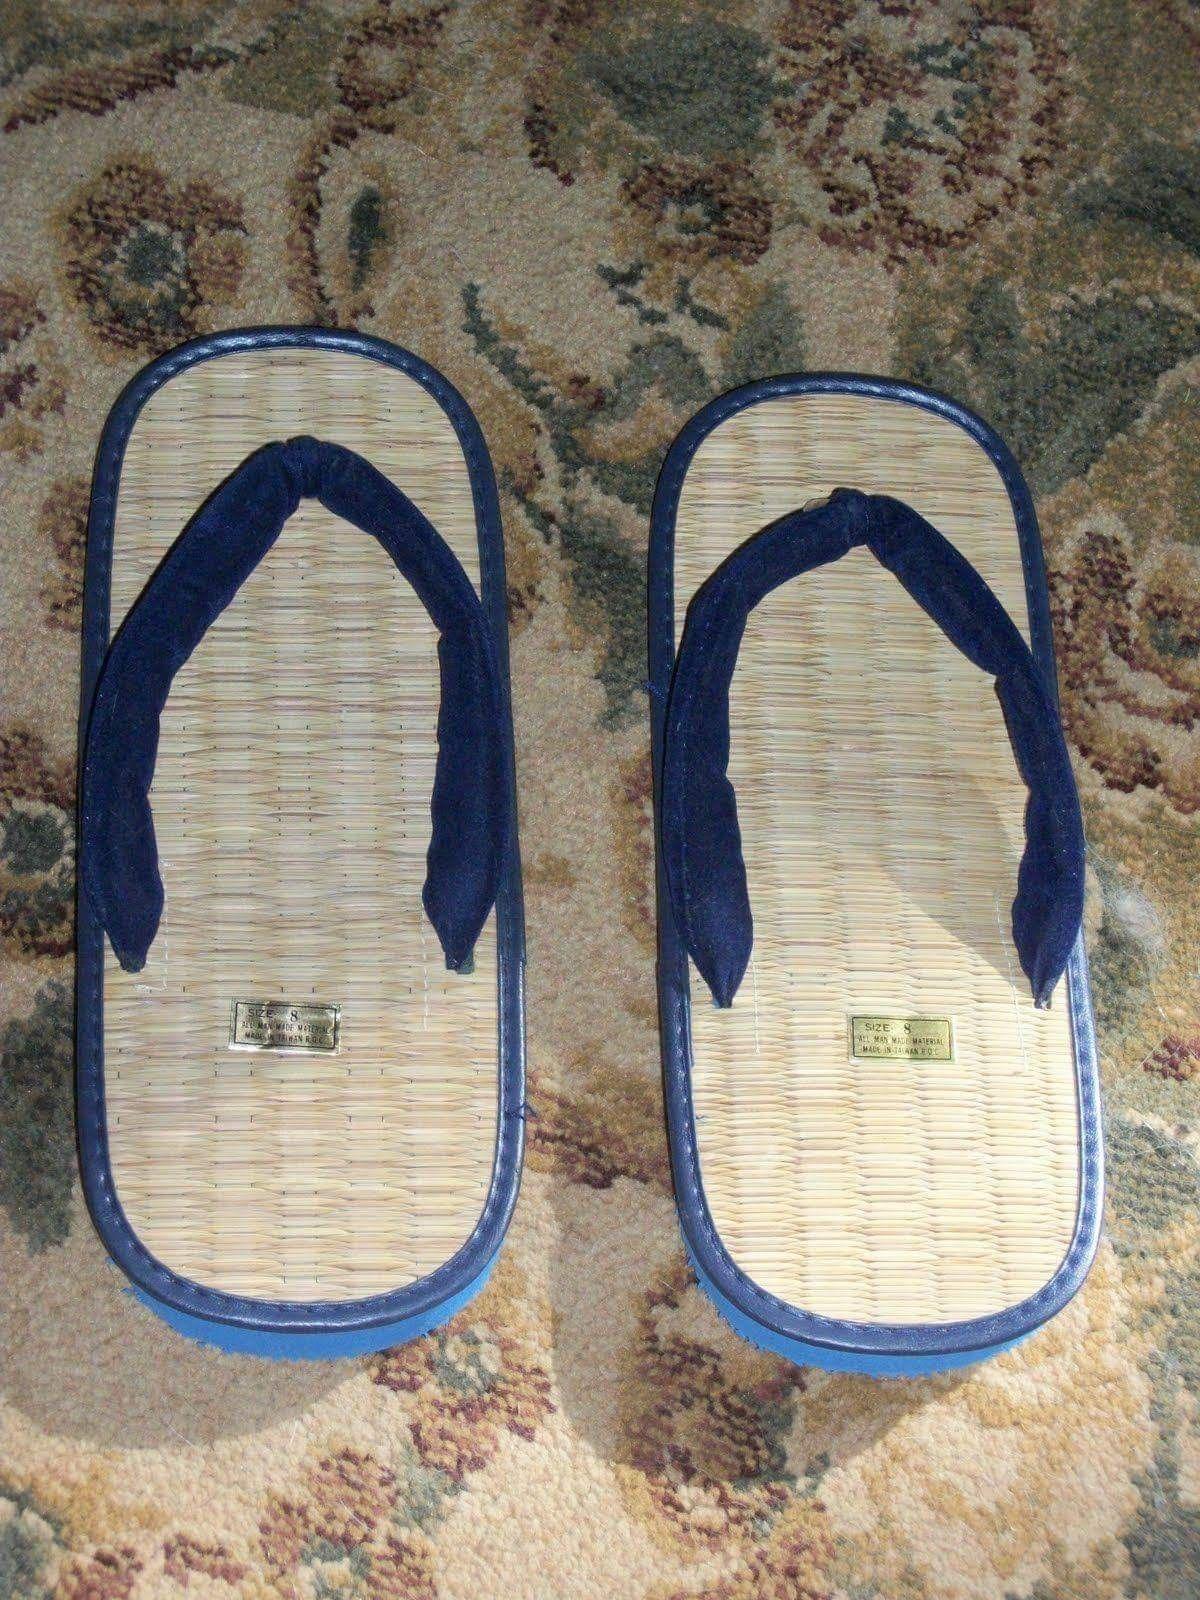 My favorite flip flop